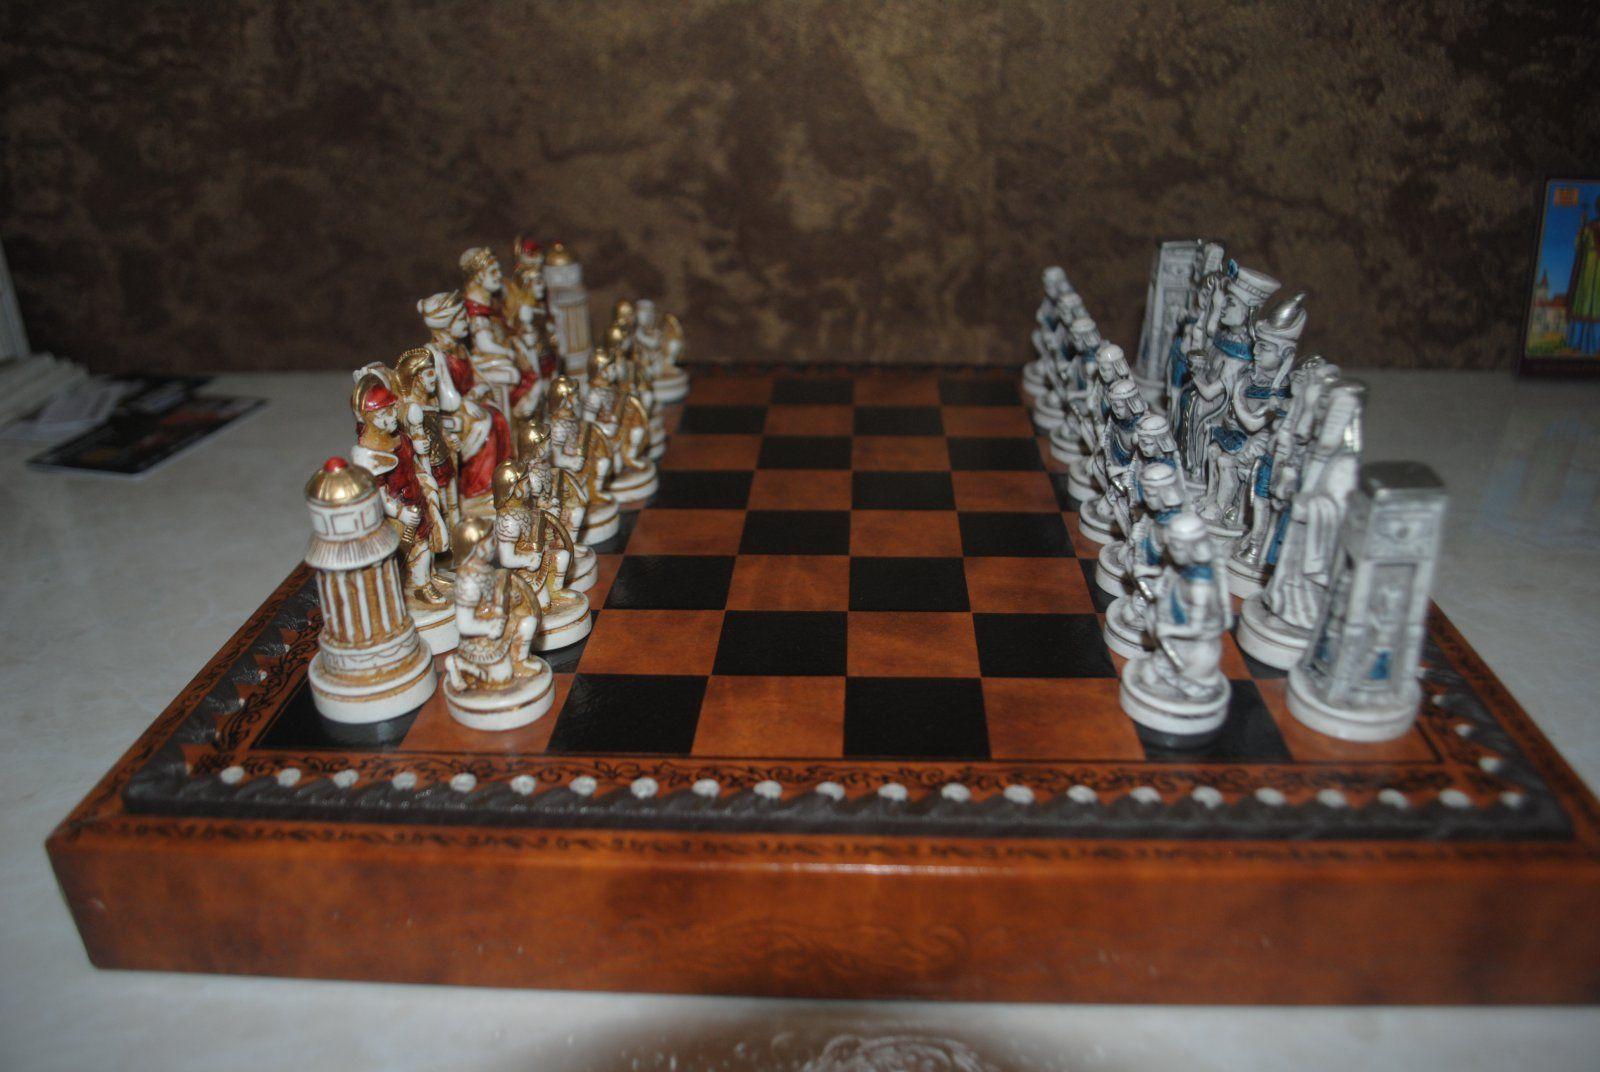 Названия шахматных фигур с картинками (27 фото) ⭐ Юмор ...